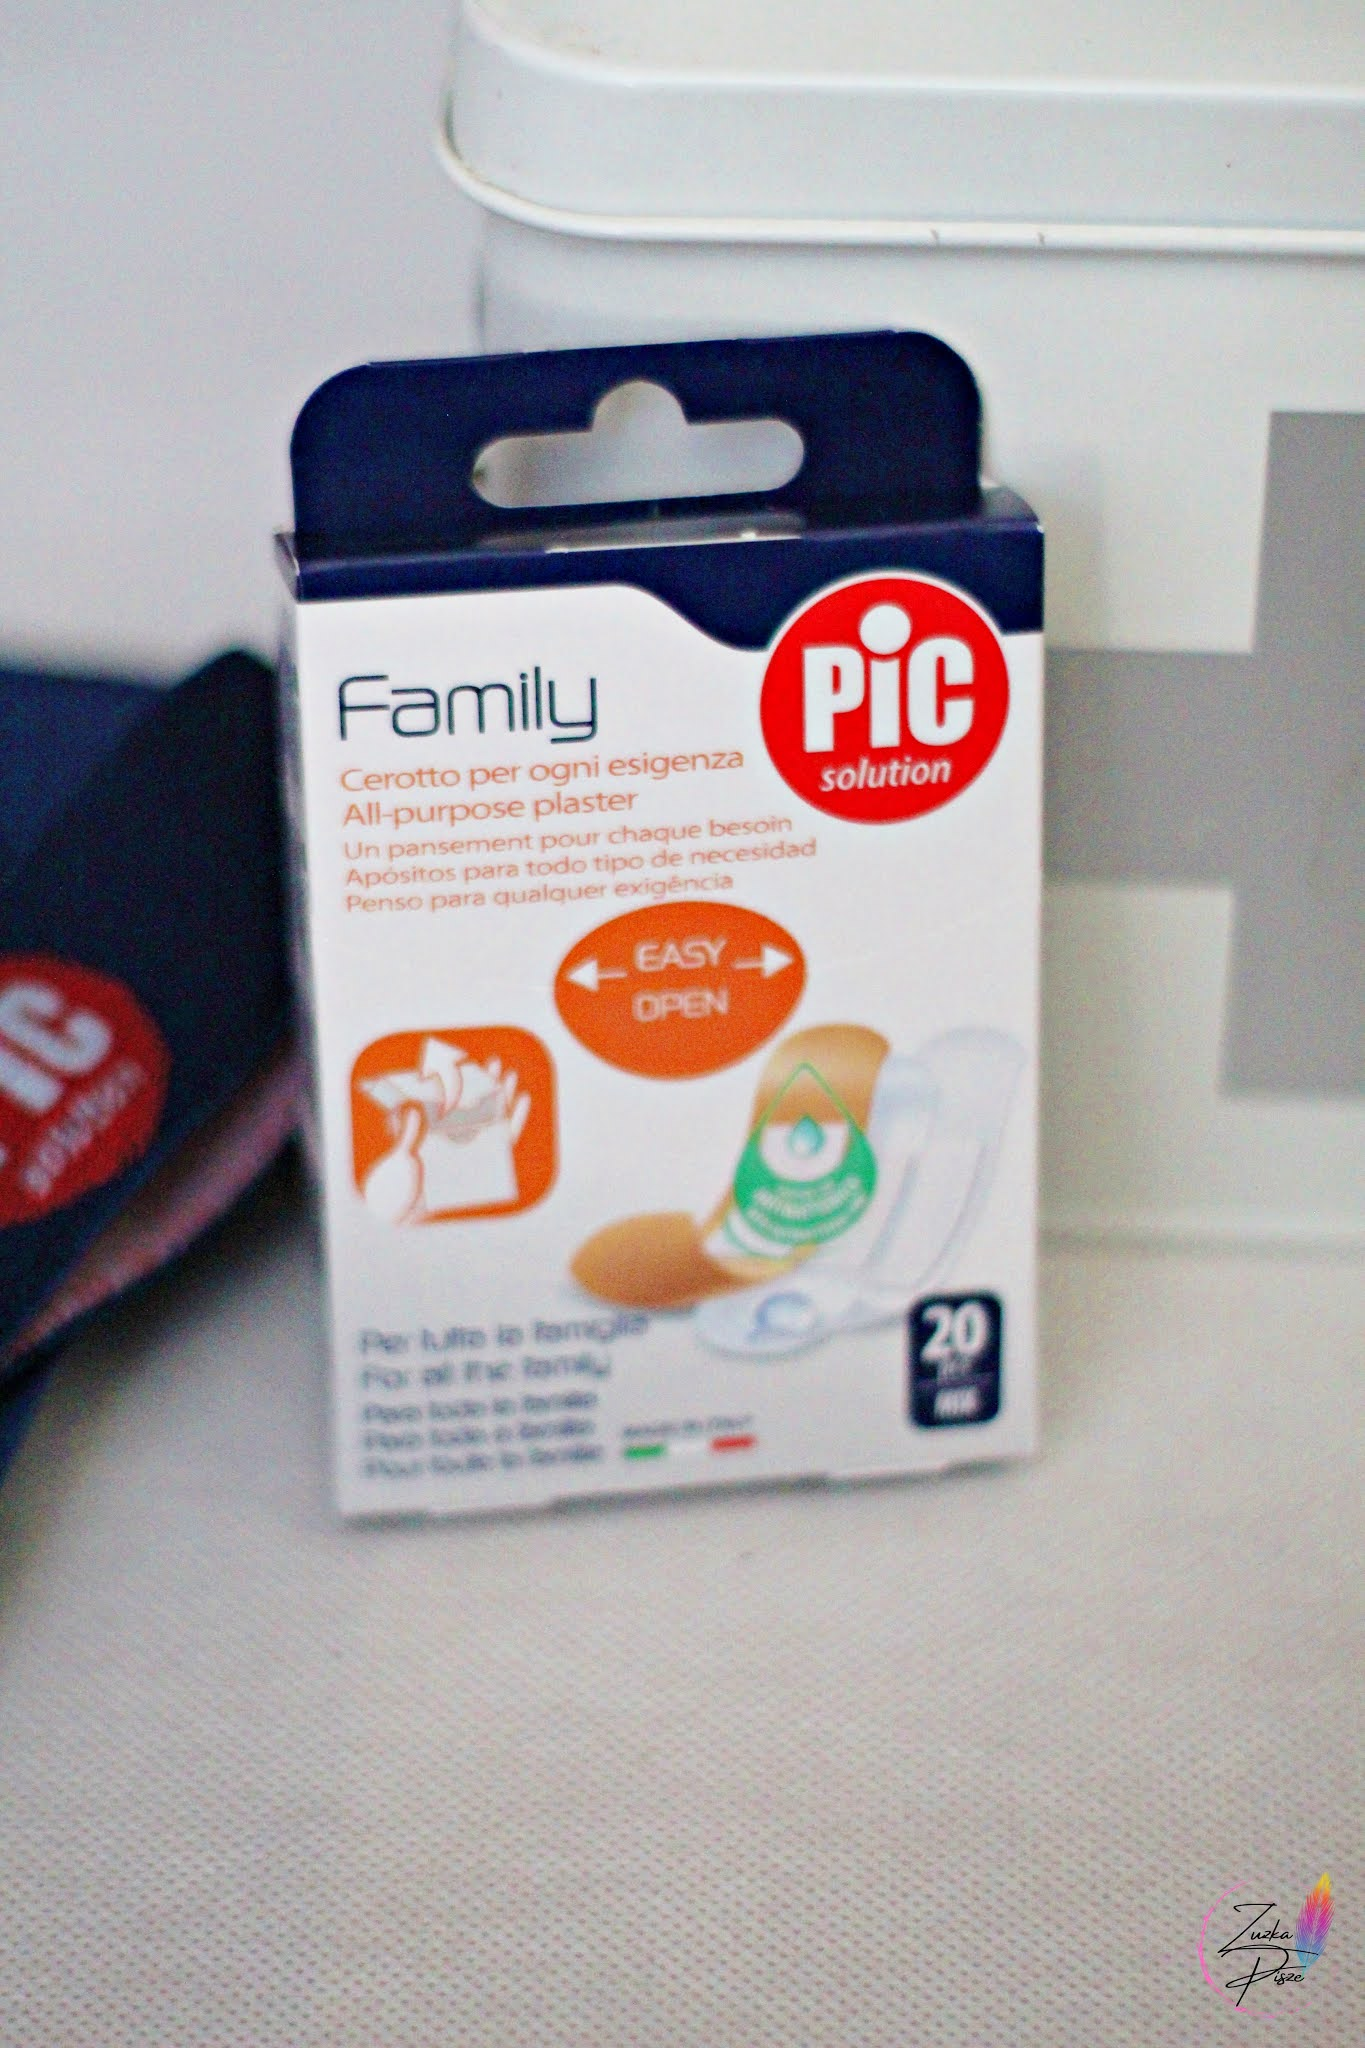 PIC Solution Family - Uniwersalne plastry z antybakteryjnym opatrunkiem